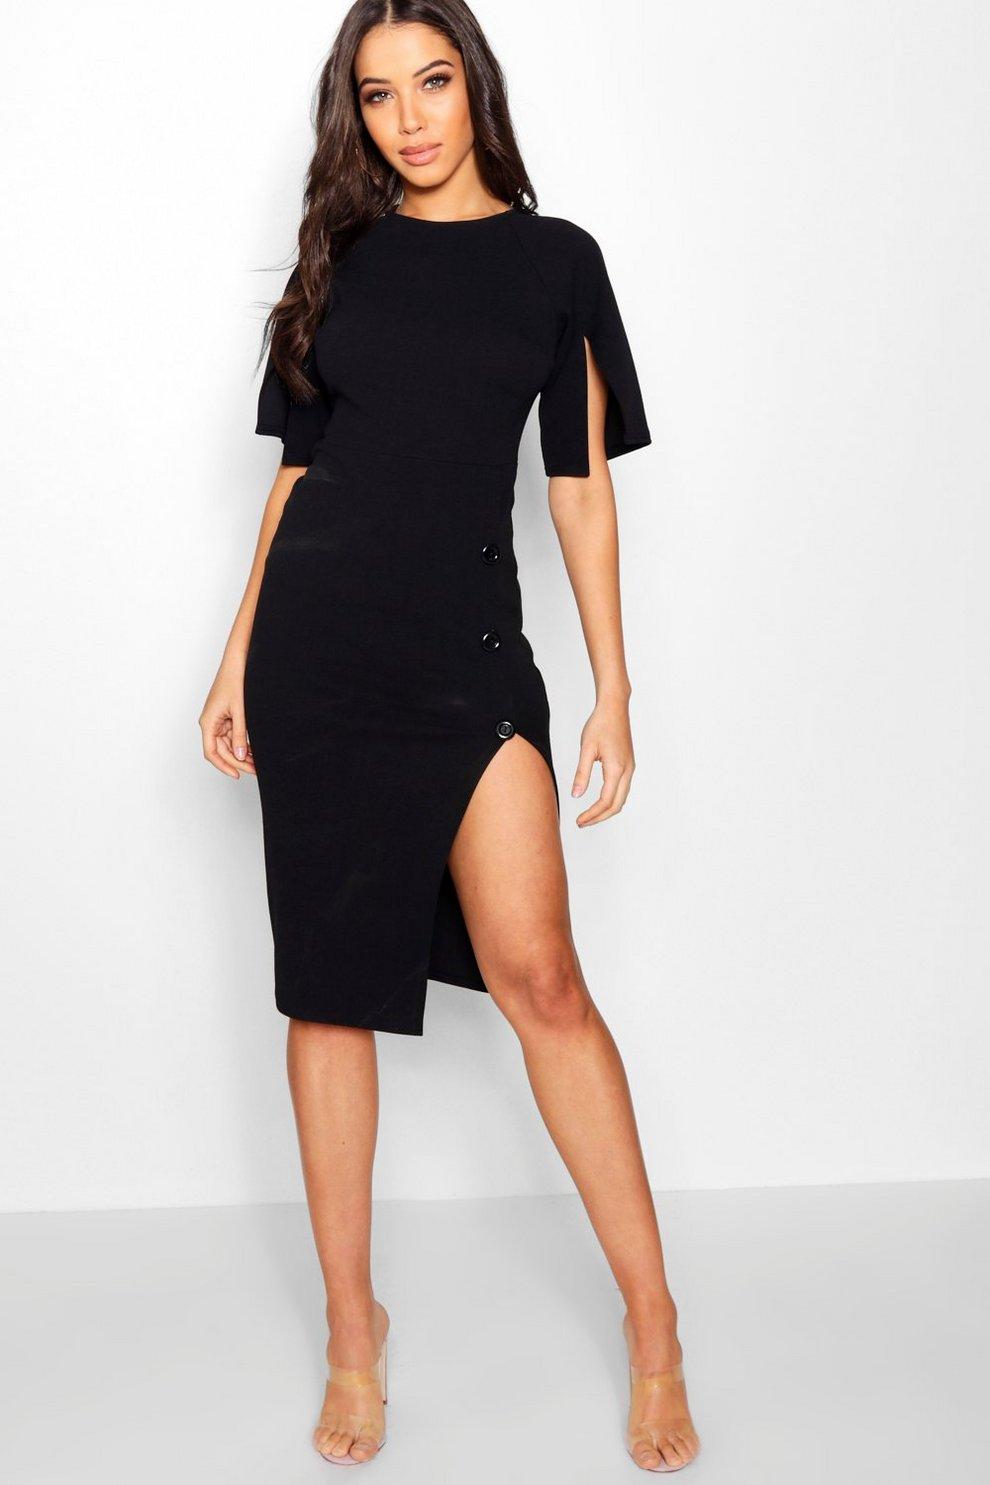 22c9b1833f86 Womens Black Split Sleeve Button Midi Dress. Hover to zoom